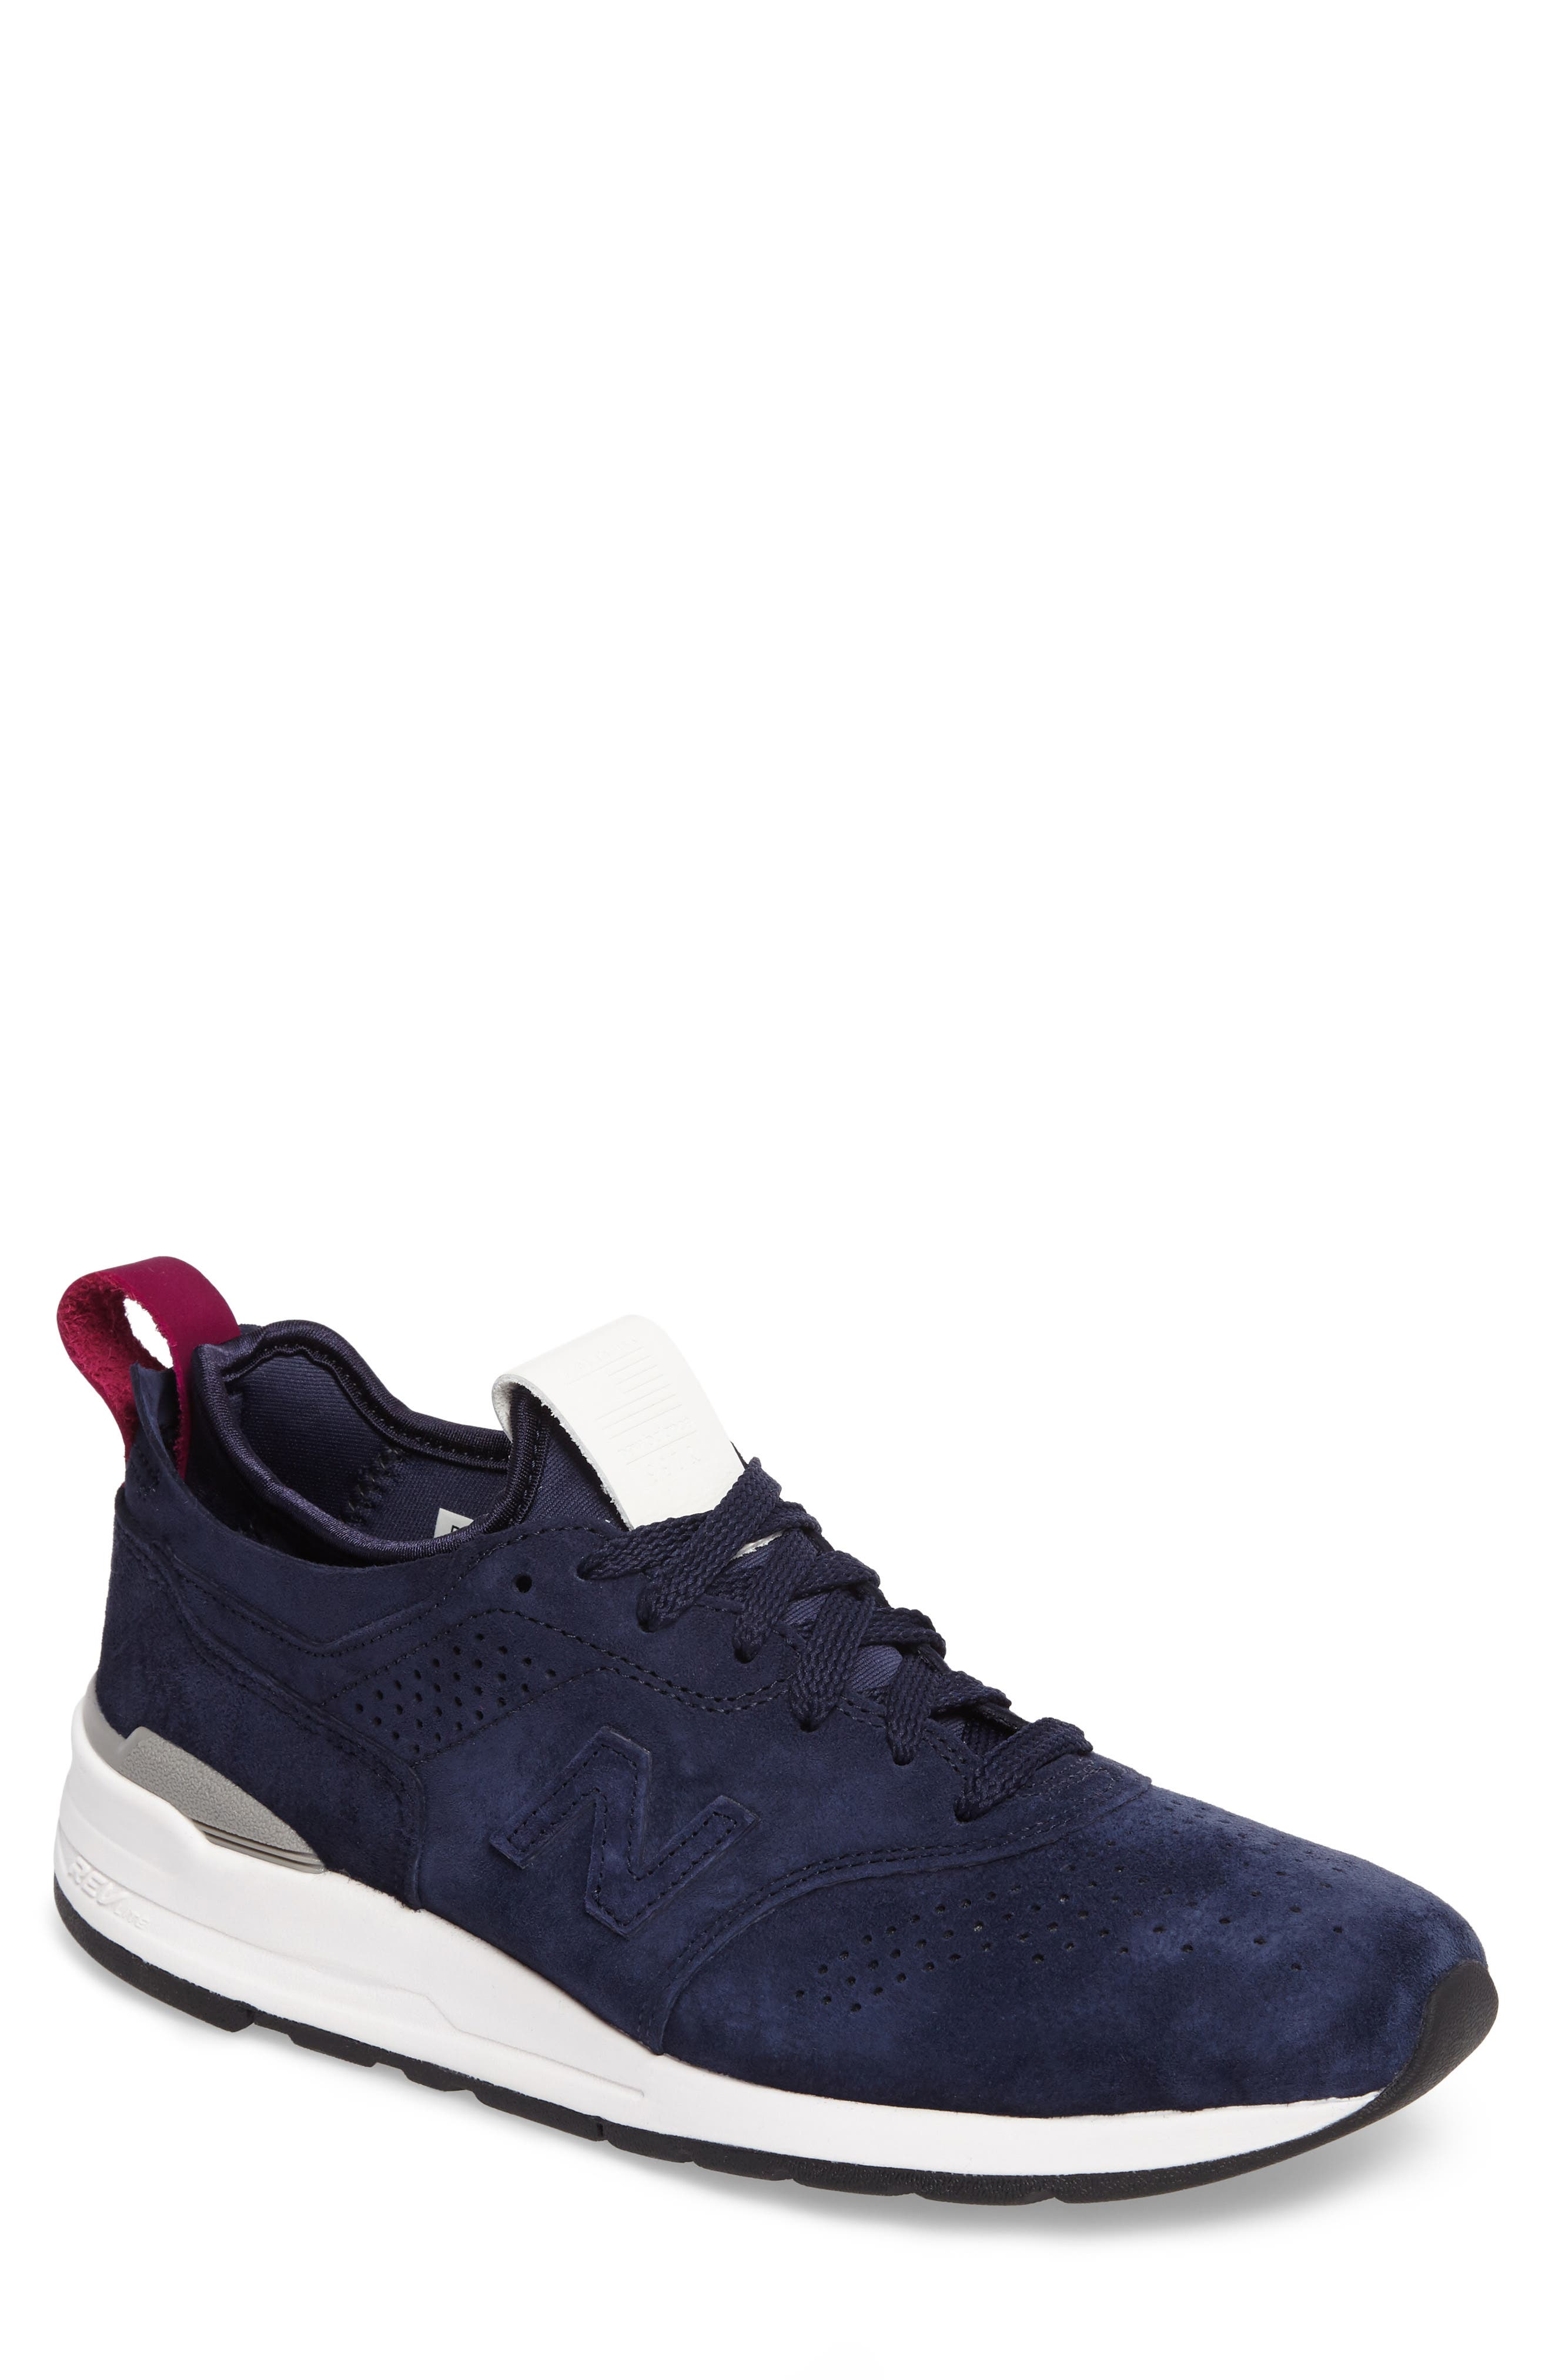 New Balance 997R Sneaker (Men)